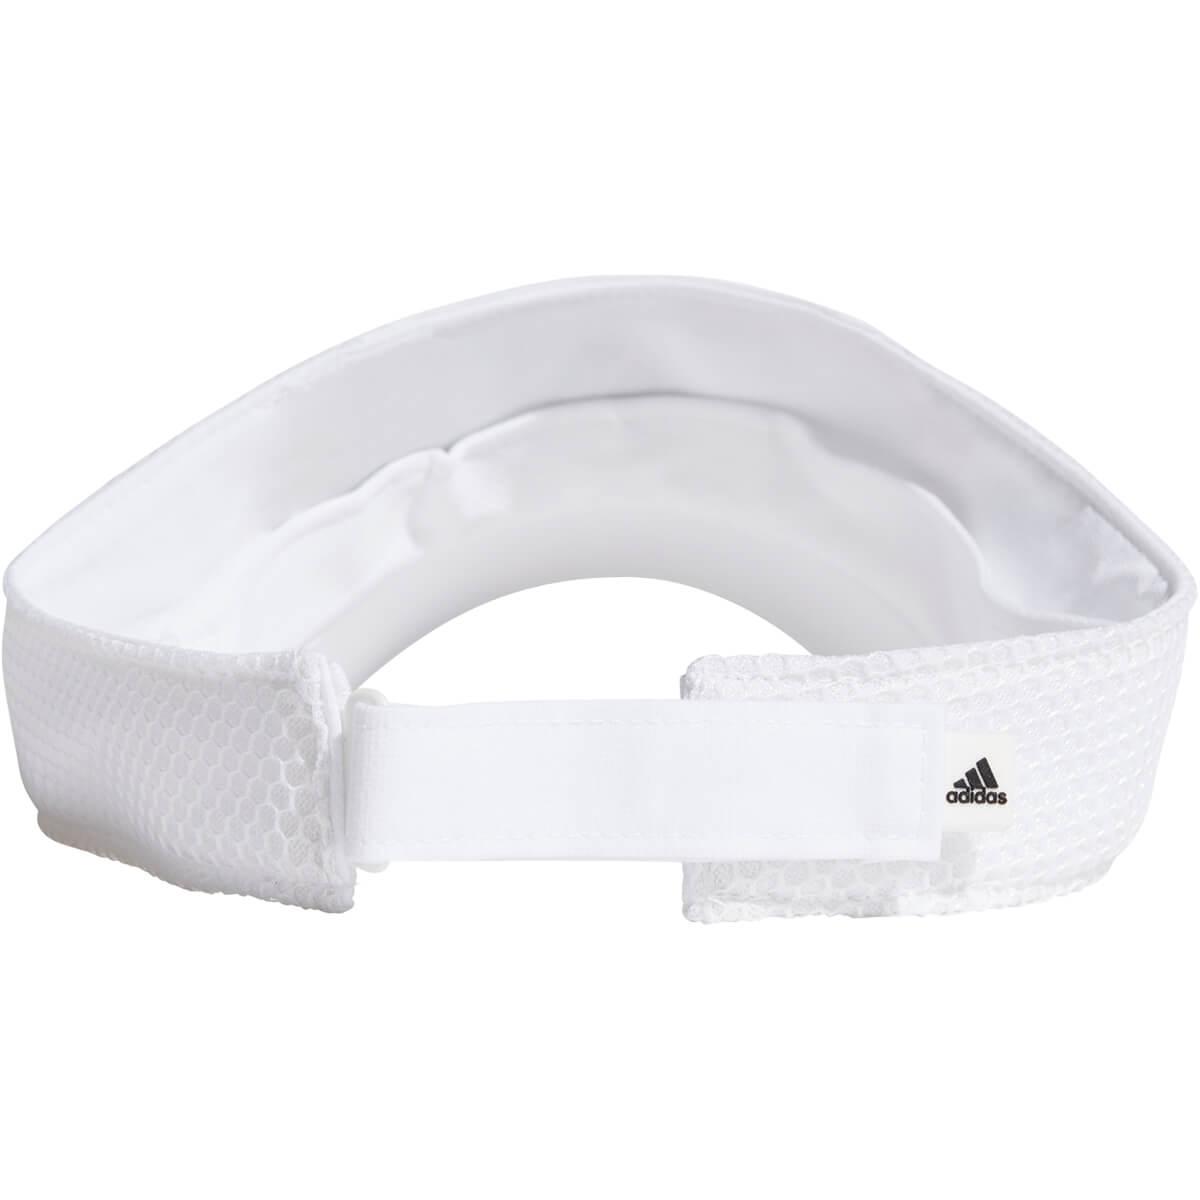 adidas Aeroready Visor Cap